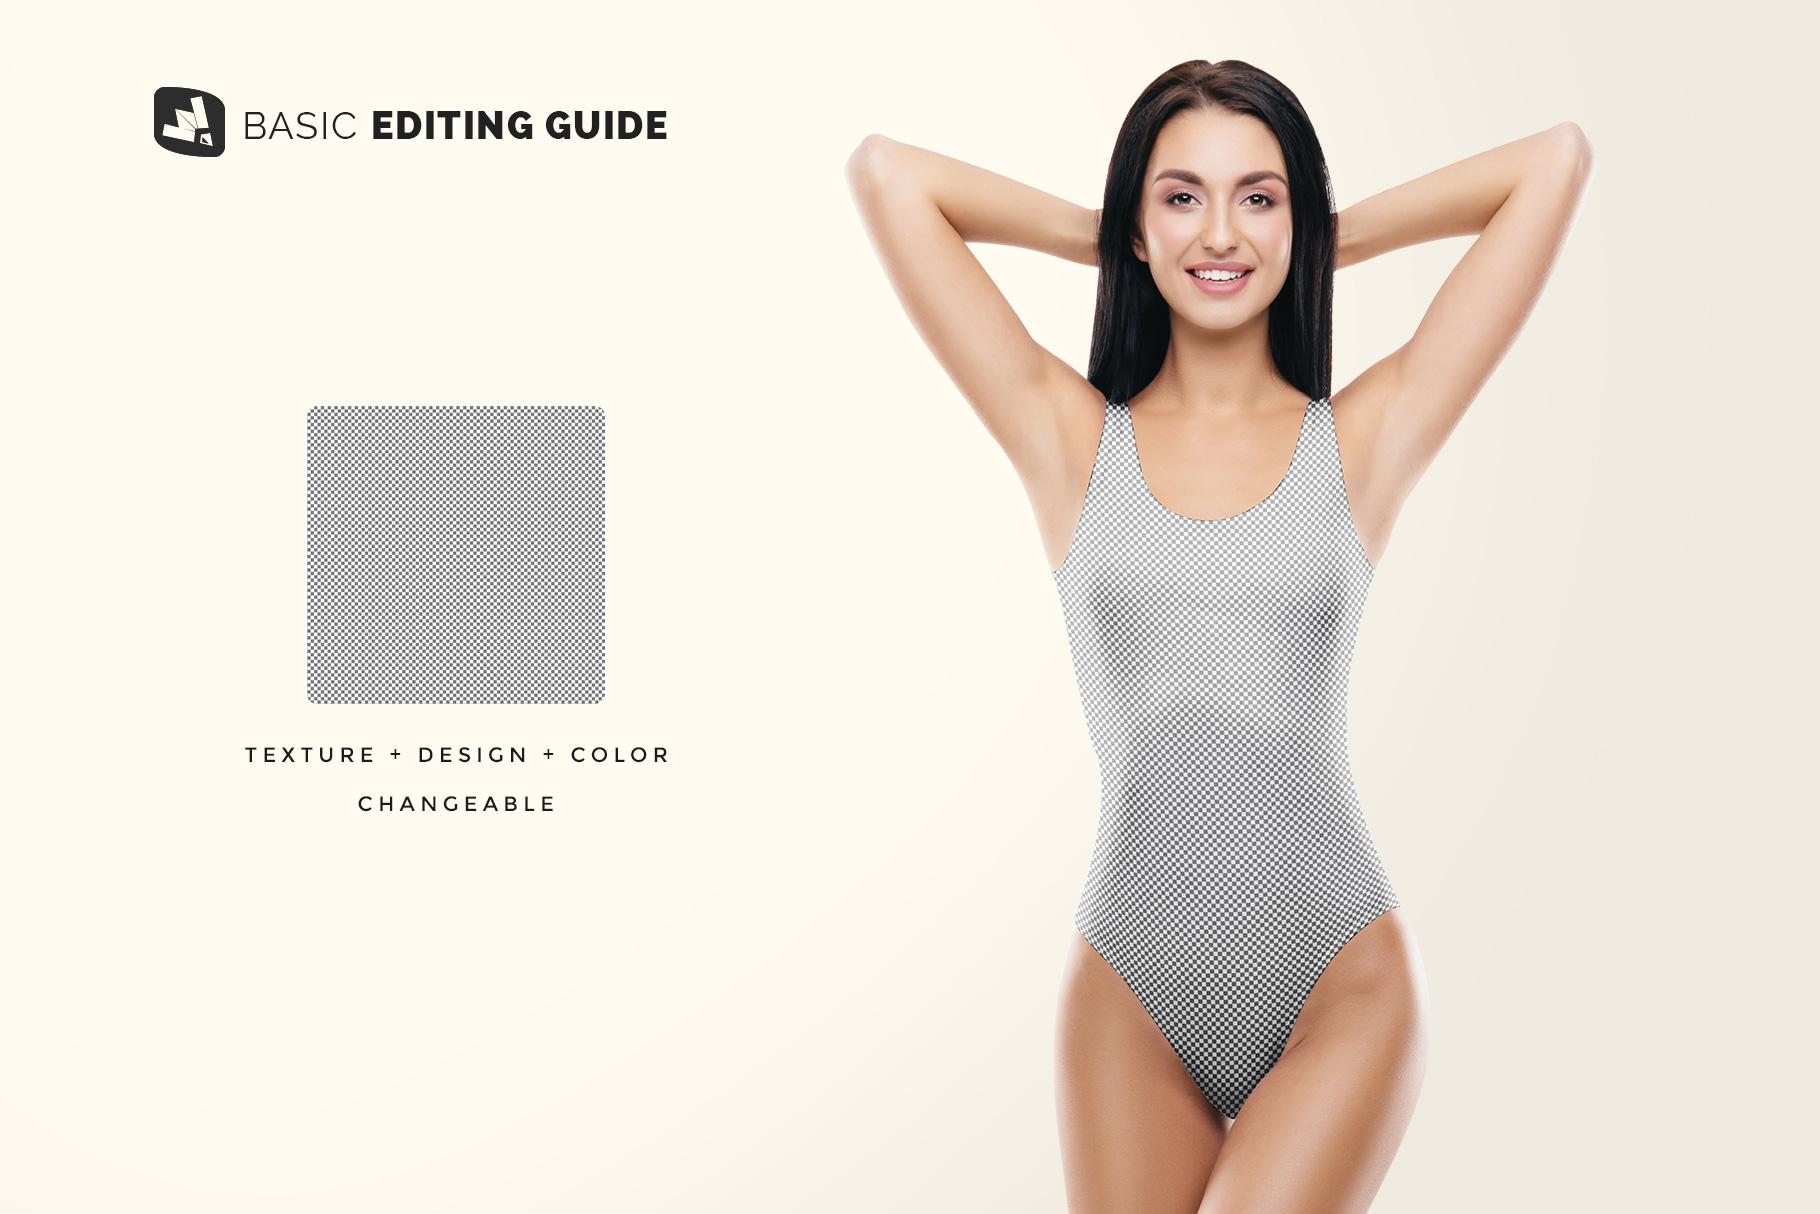 editability of the women's swimsuit mockup